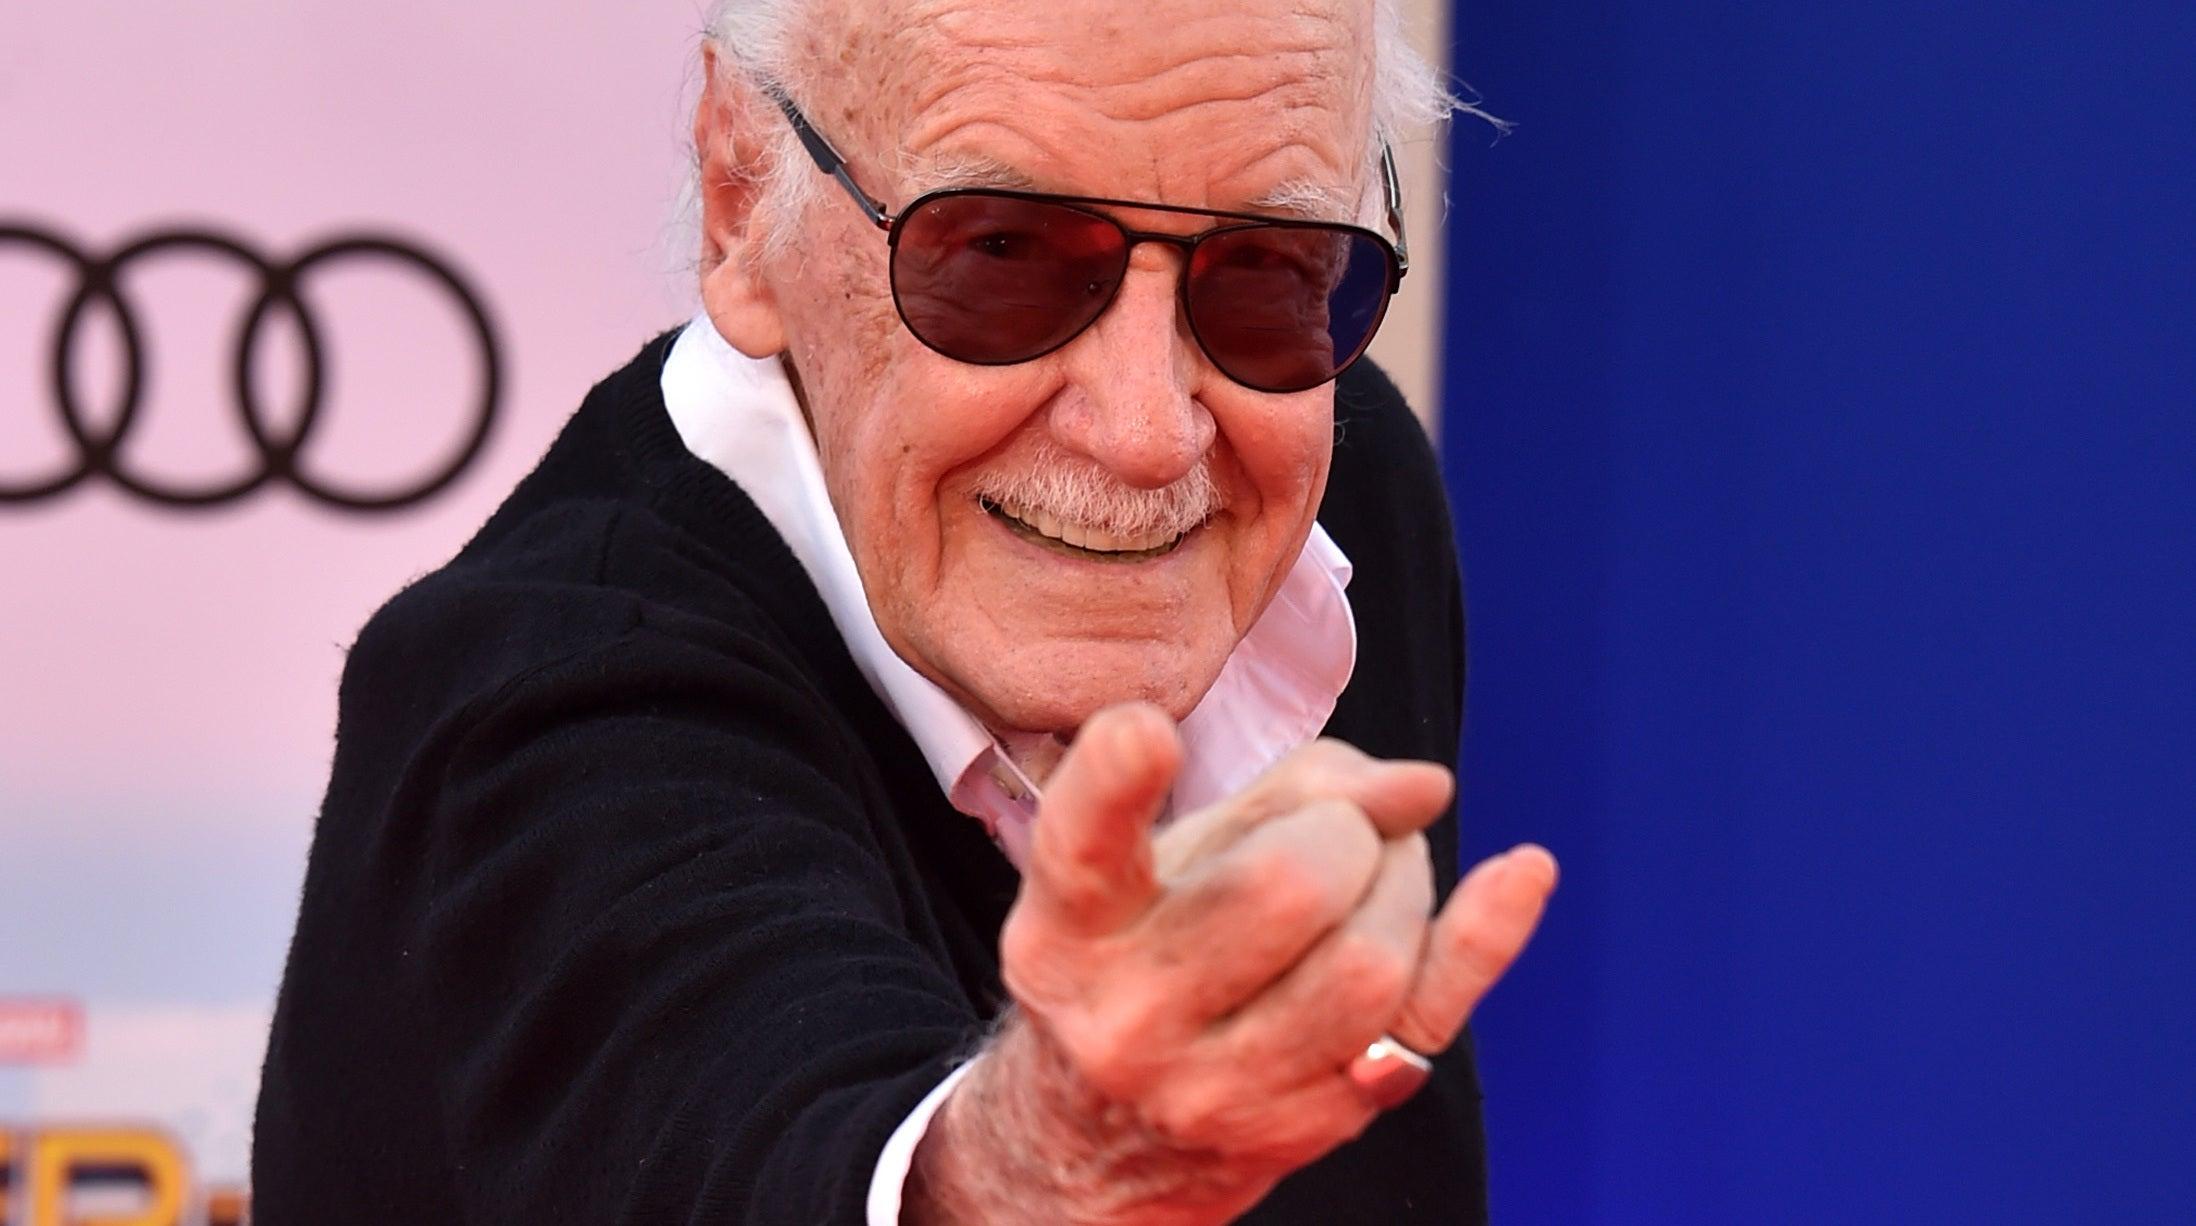 Siri Erroneously Told People Stan Lee Was Dead